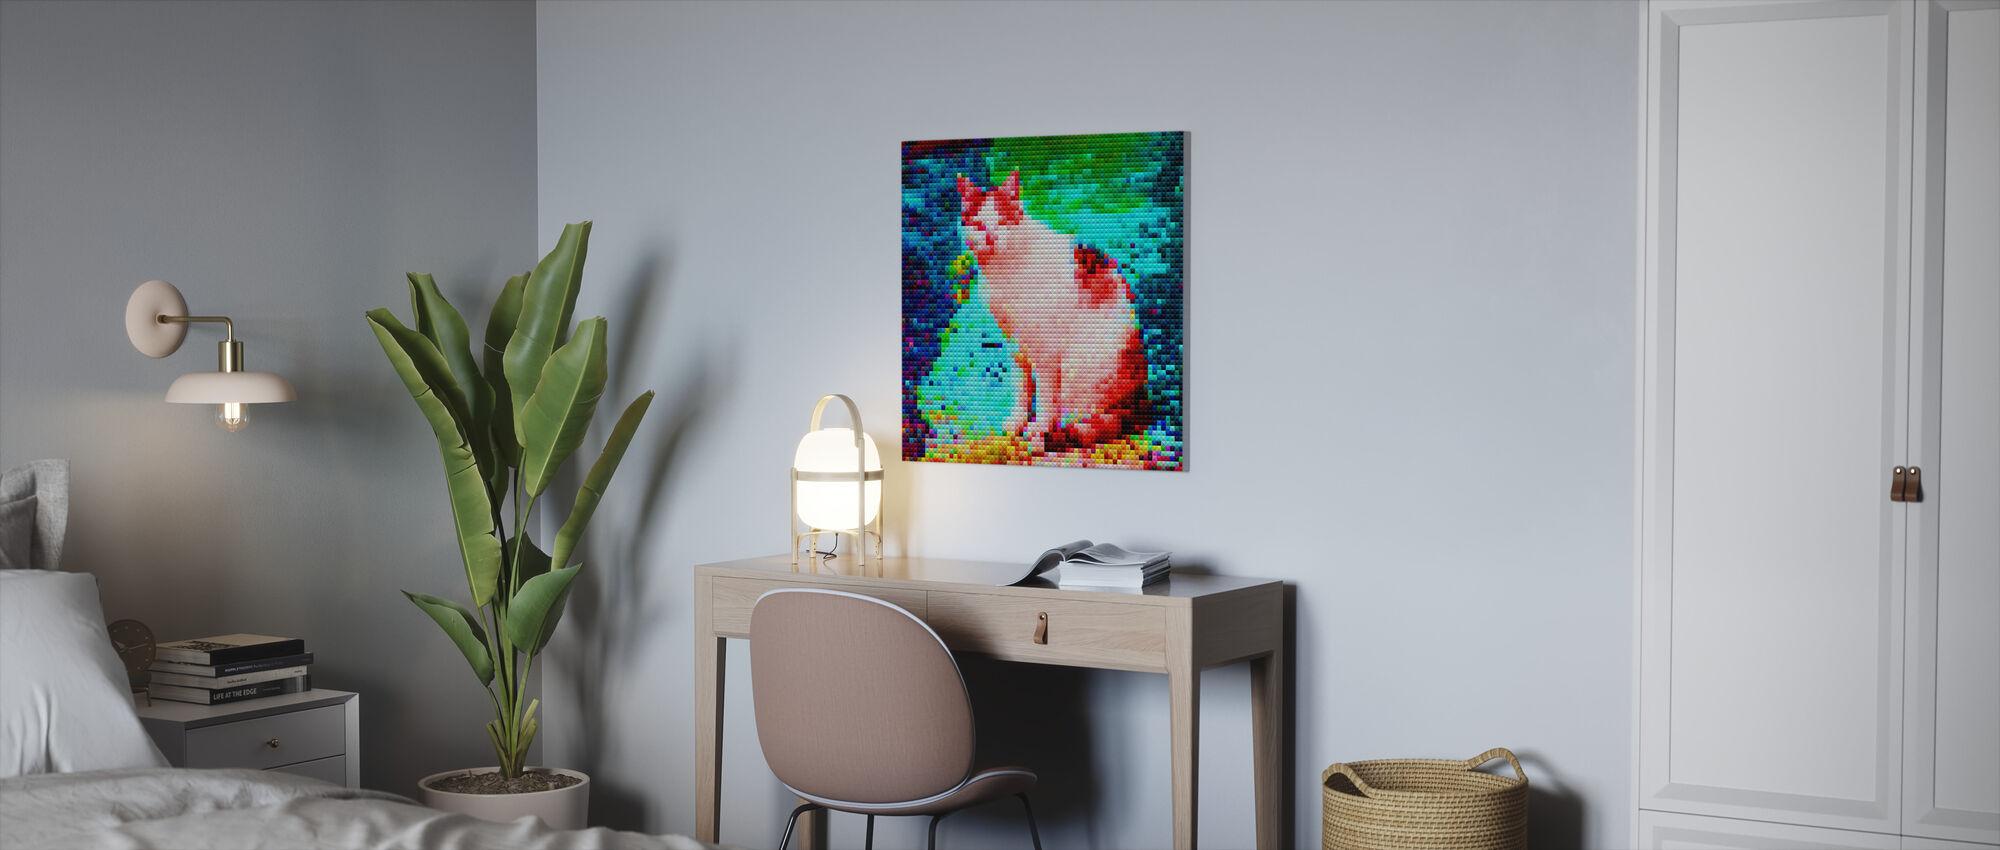 Mosaik Katt - Canvastavla - Kontor